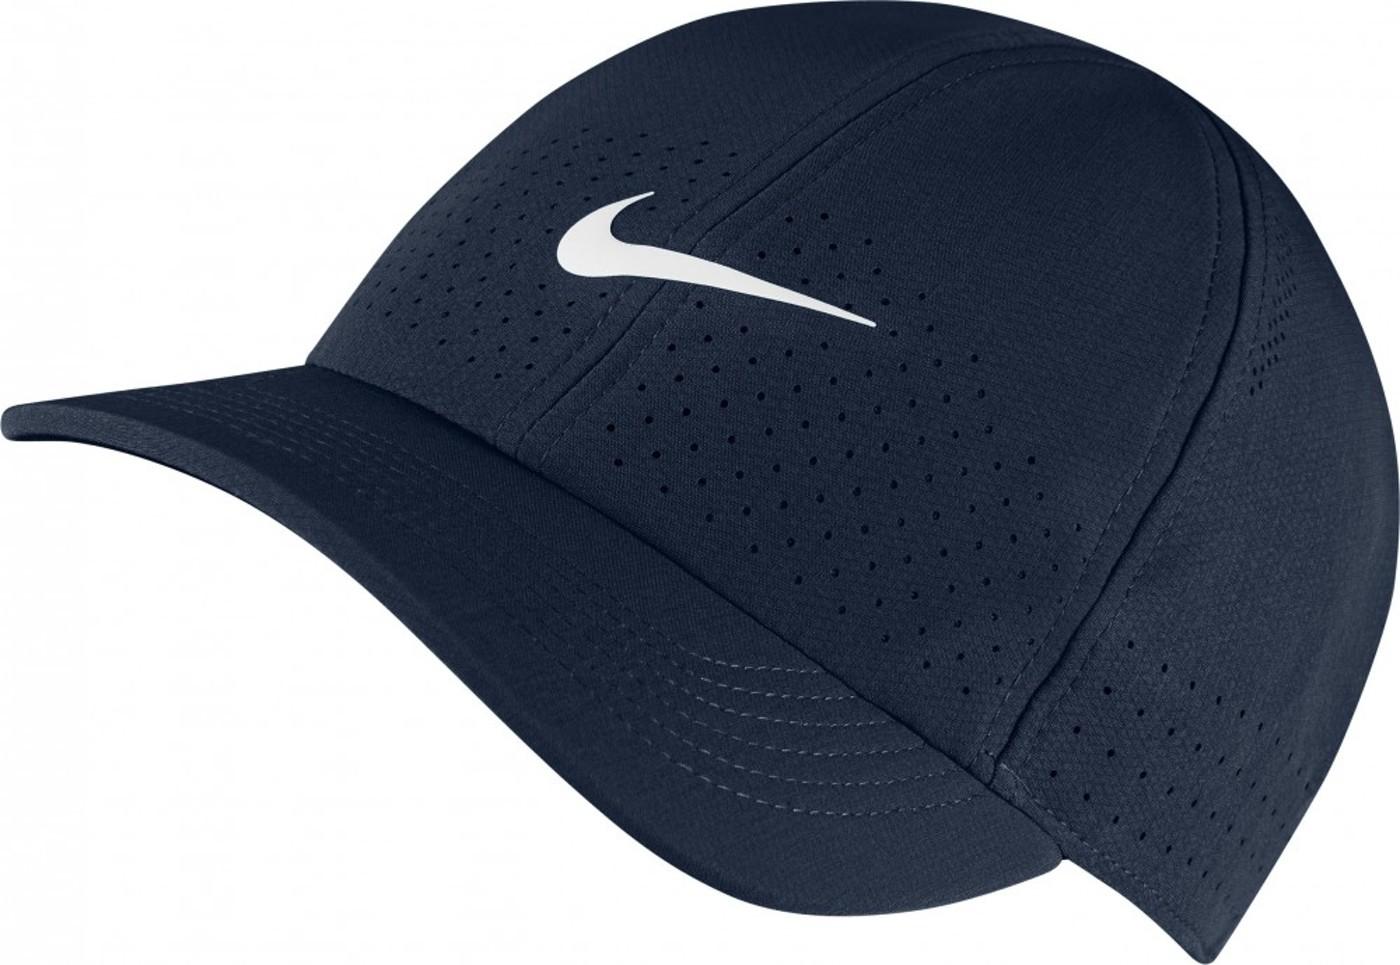 NikeCourt AeroBill Advantage T - Herren